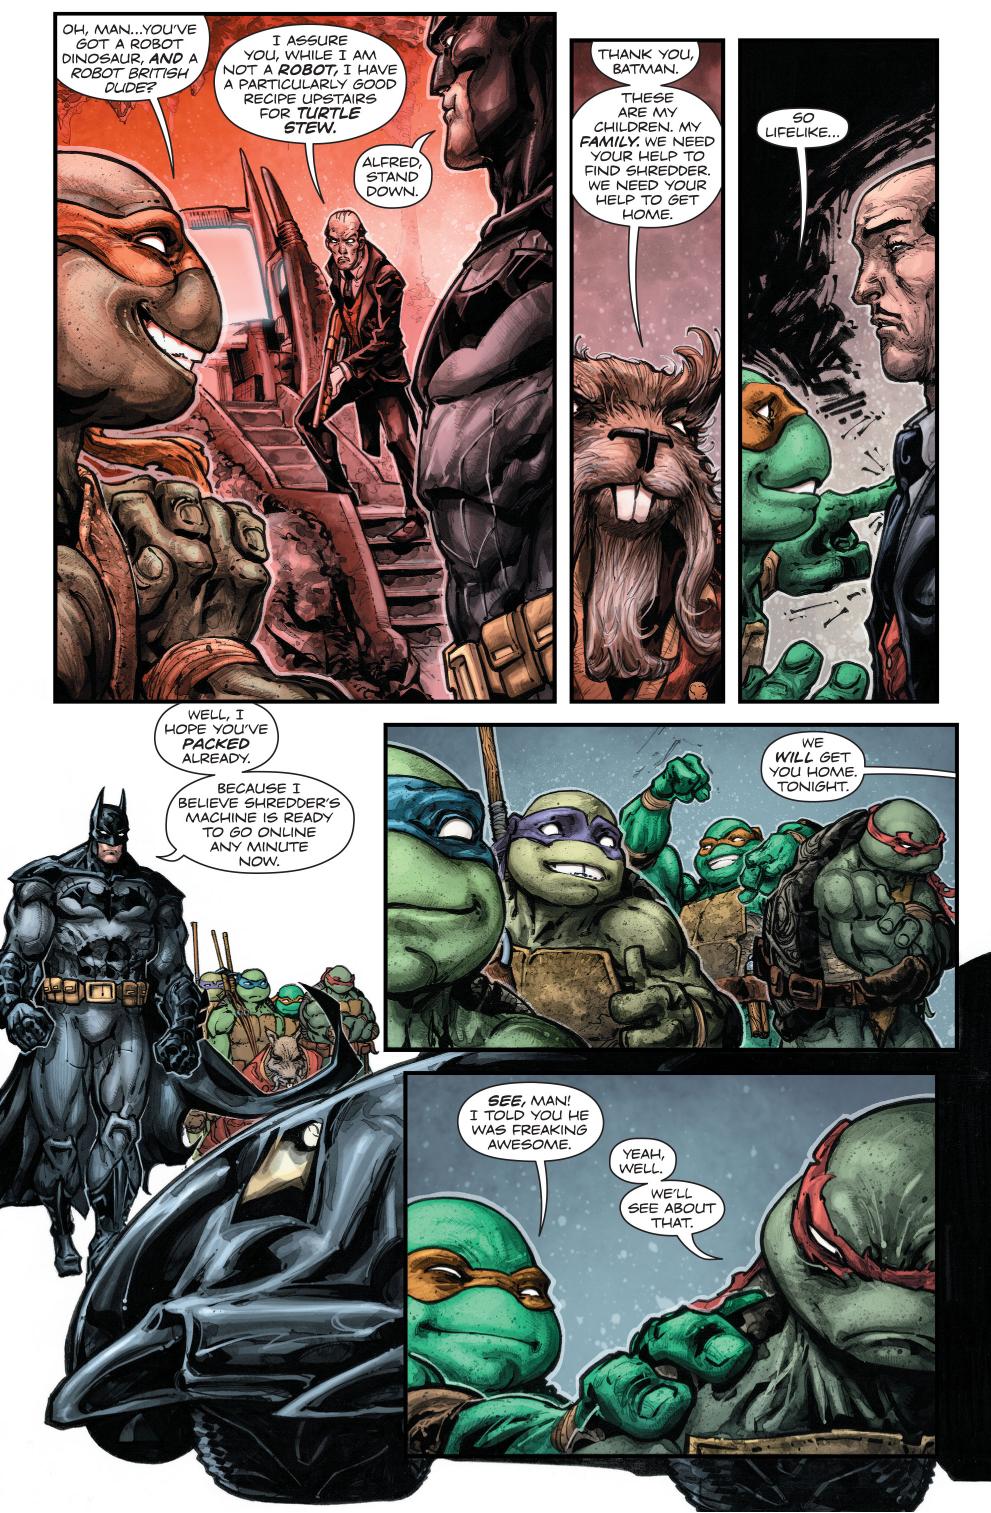 teenage mutant ninja turtles in the batcave